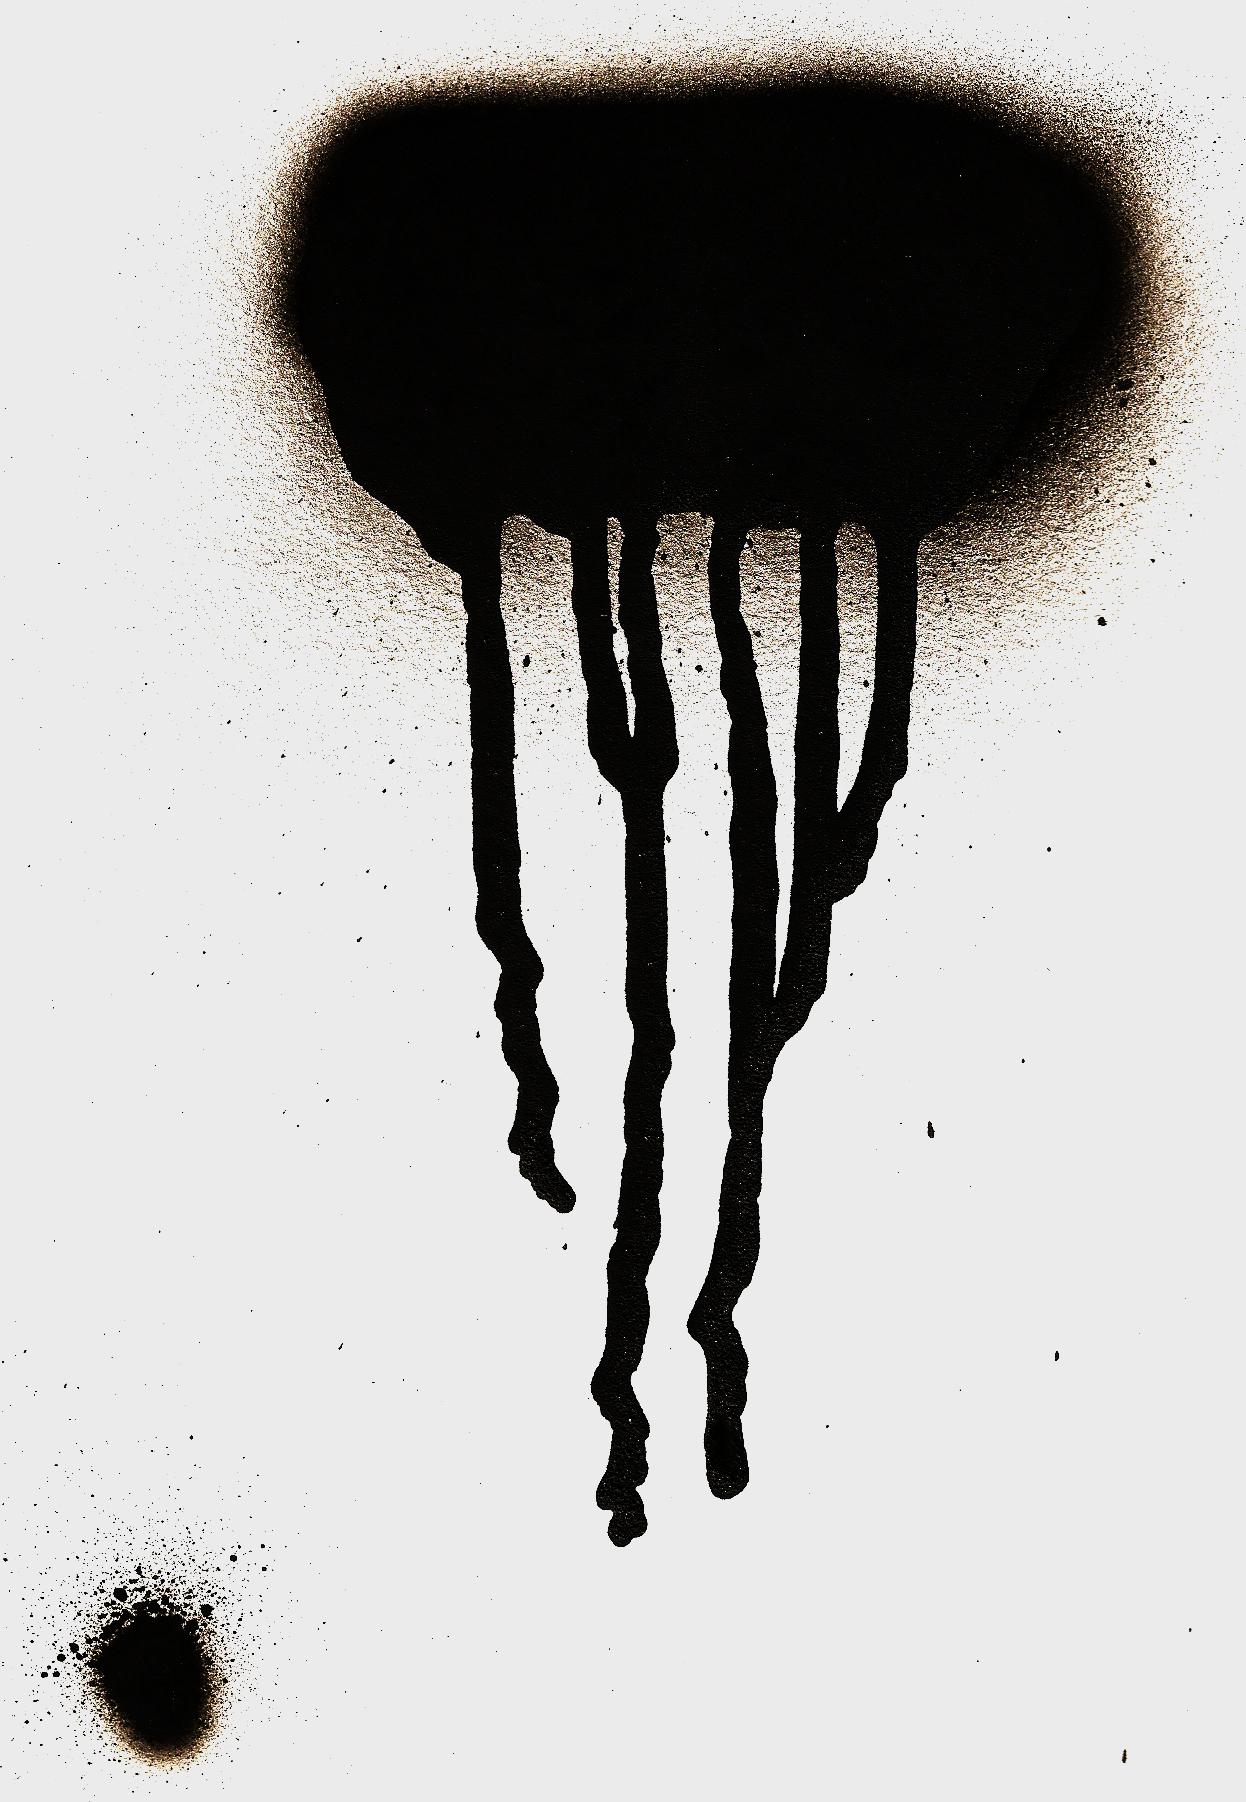 free spray paint drip textures